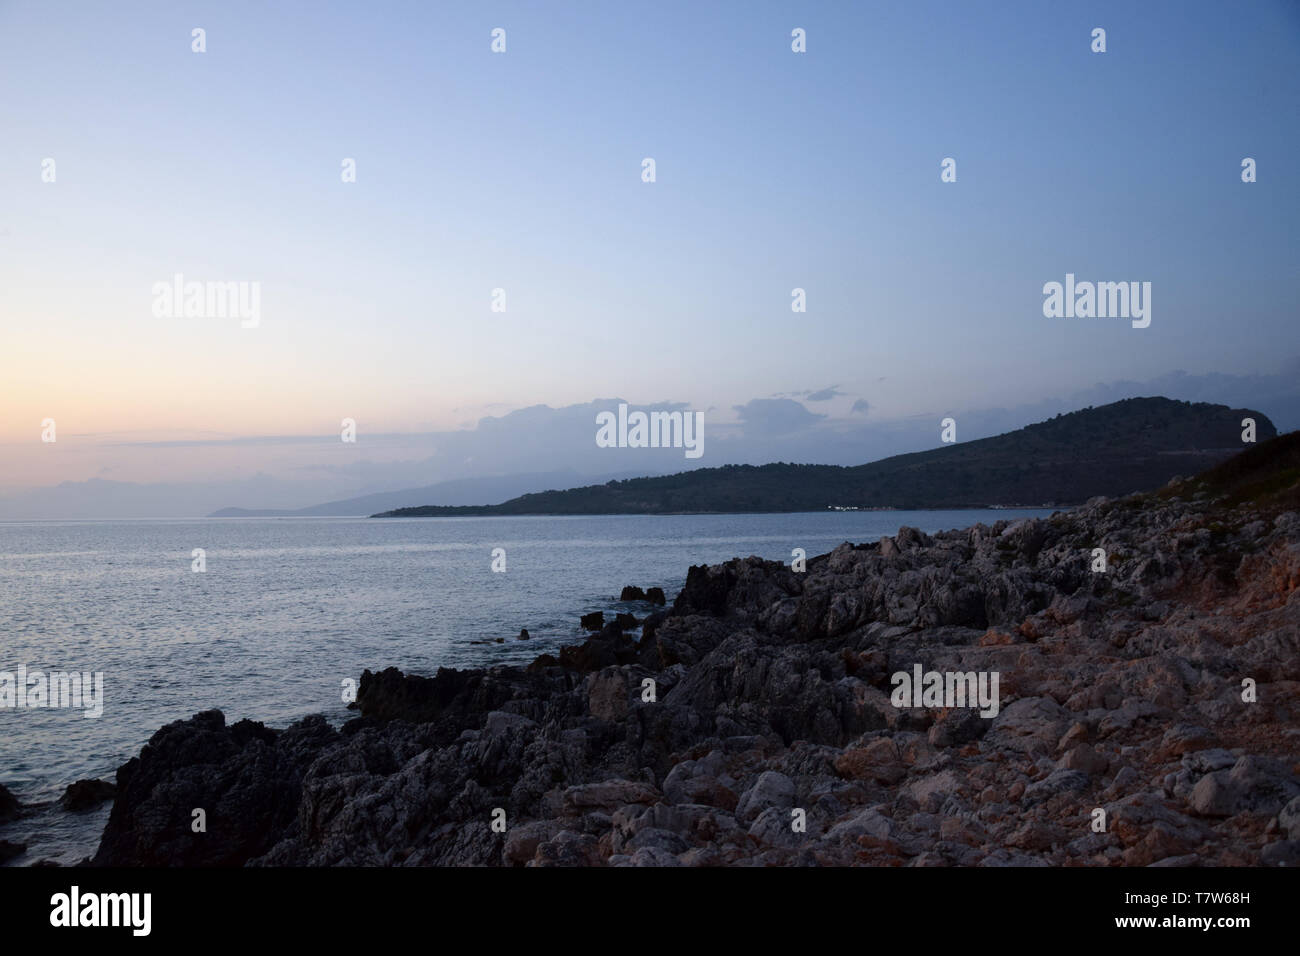 Golden hour Sundown, with view to Korfu island. Sunset on the beach in Ksamil near Saranda, Albania. - Stock Image